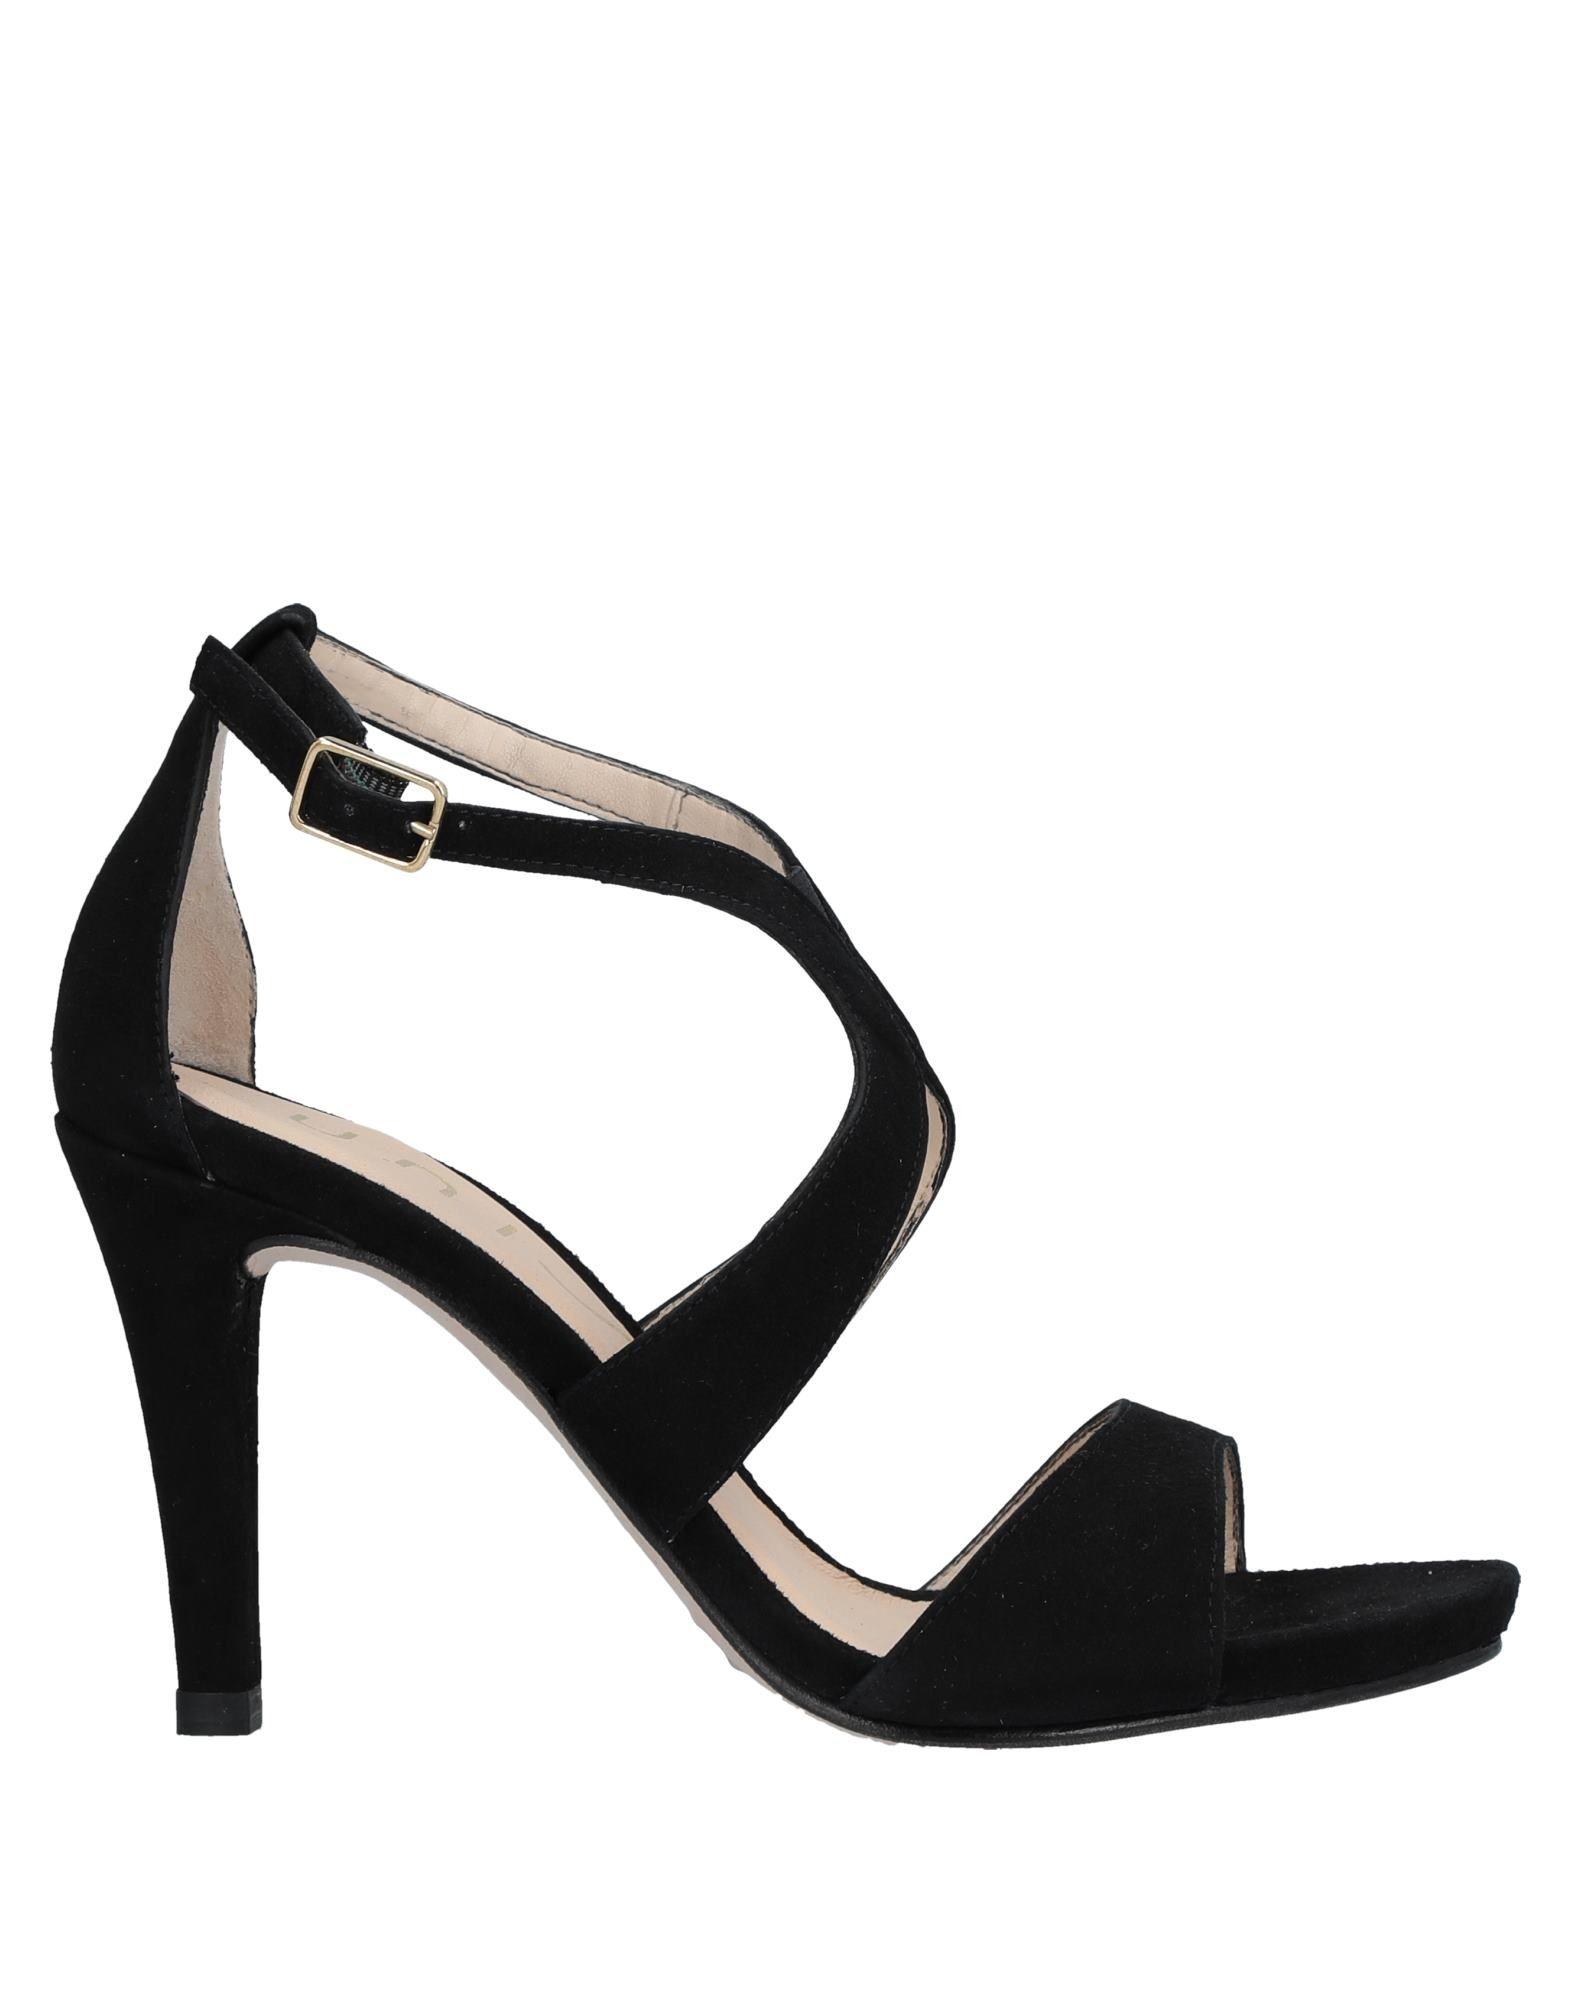 Sandali Unisa Donna - 11529274US elegante